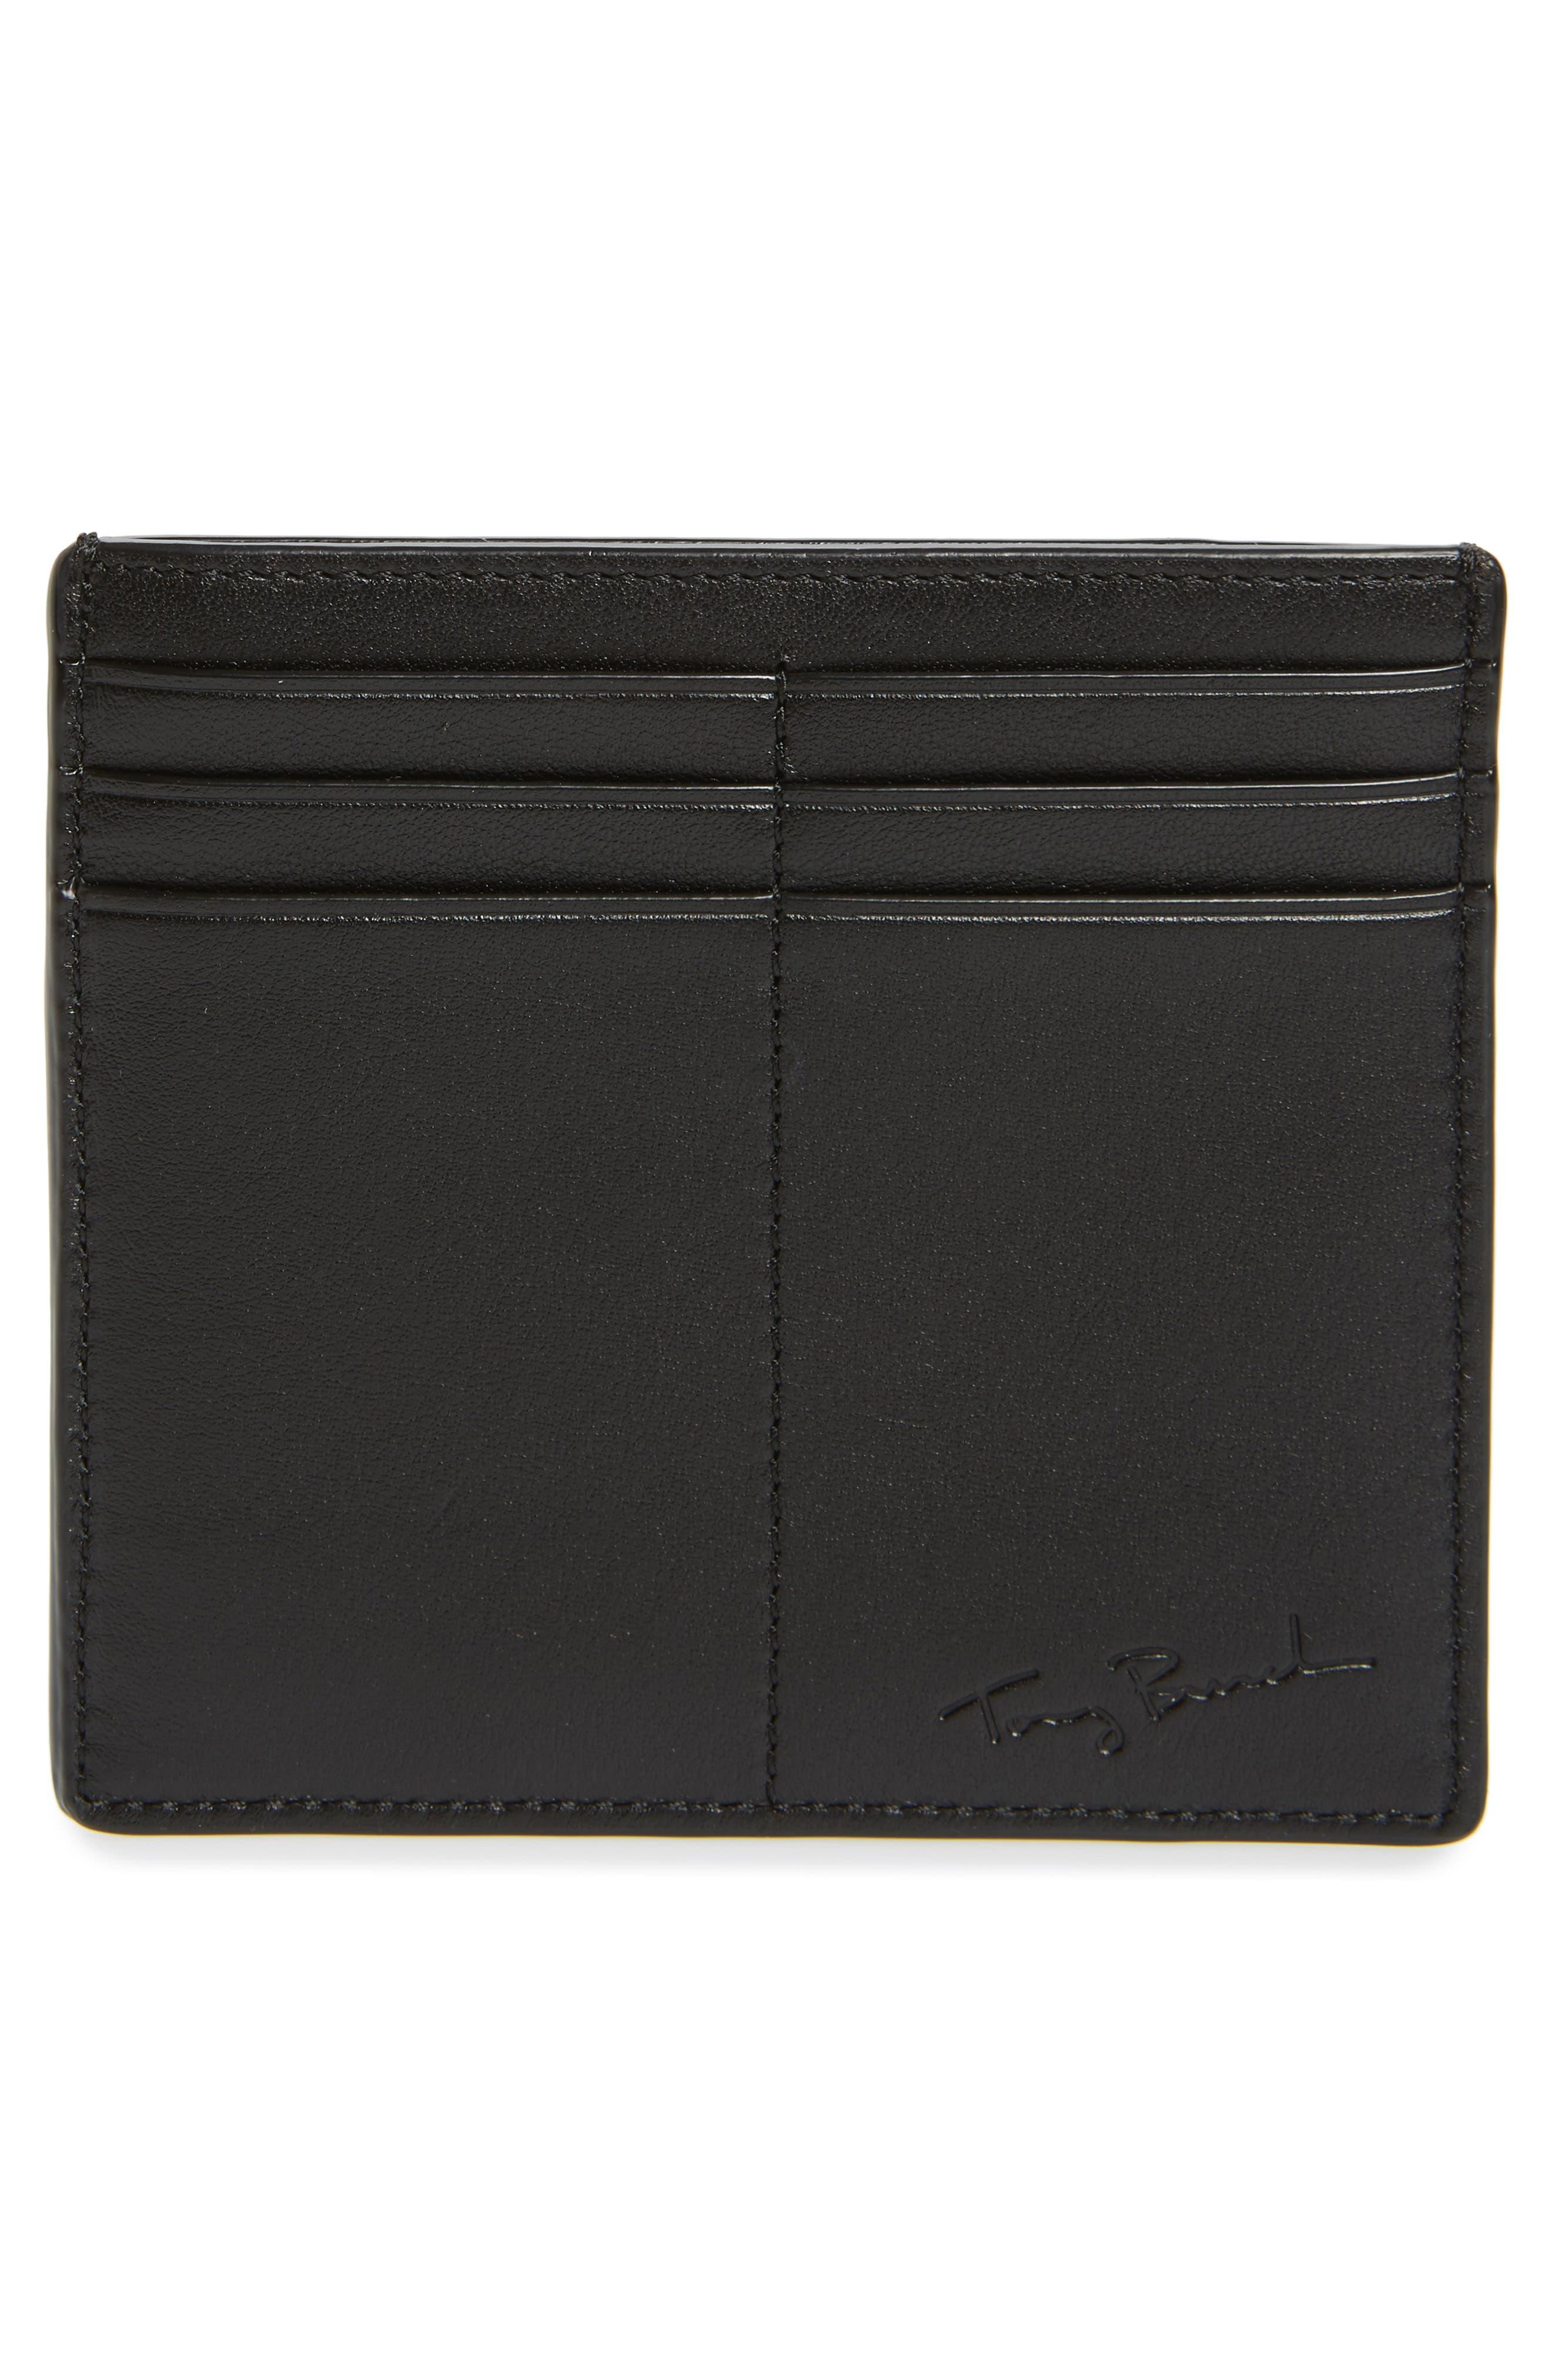 Alternate Image 2  - Tory Burch Martini Appliqué Leather Card Case